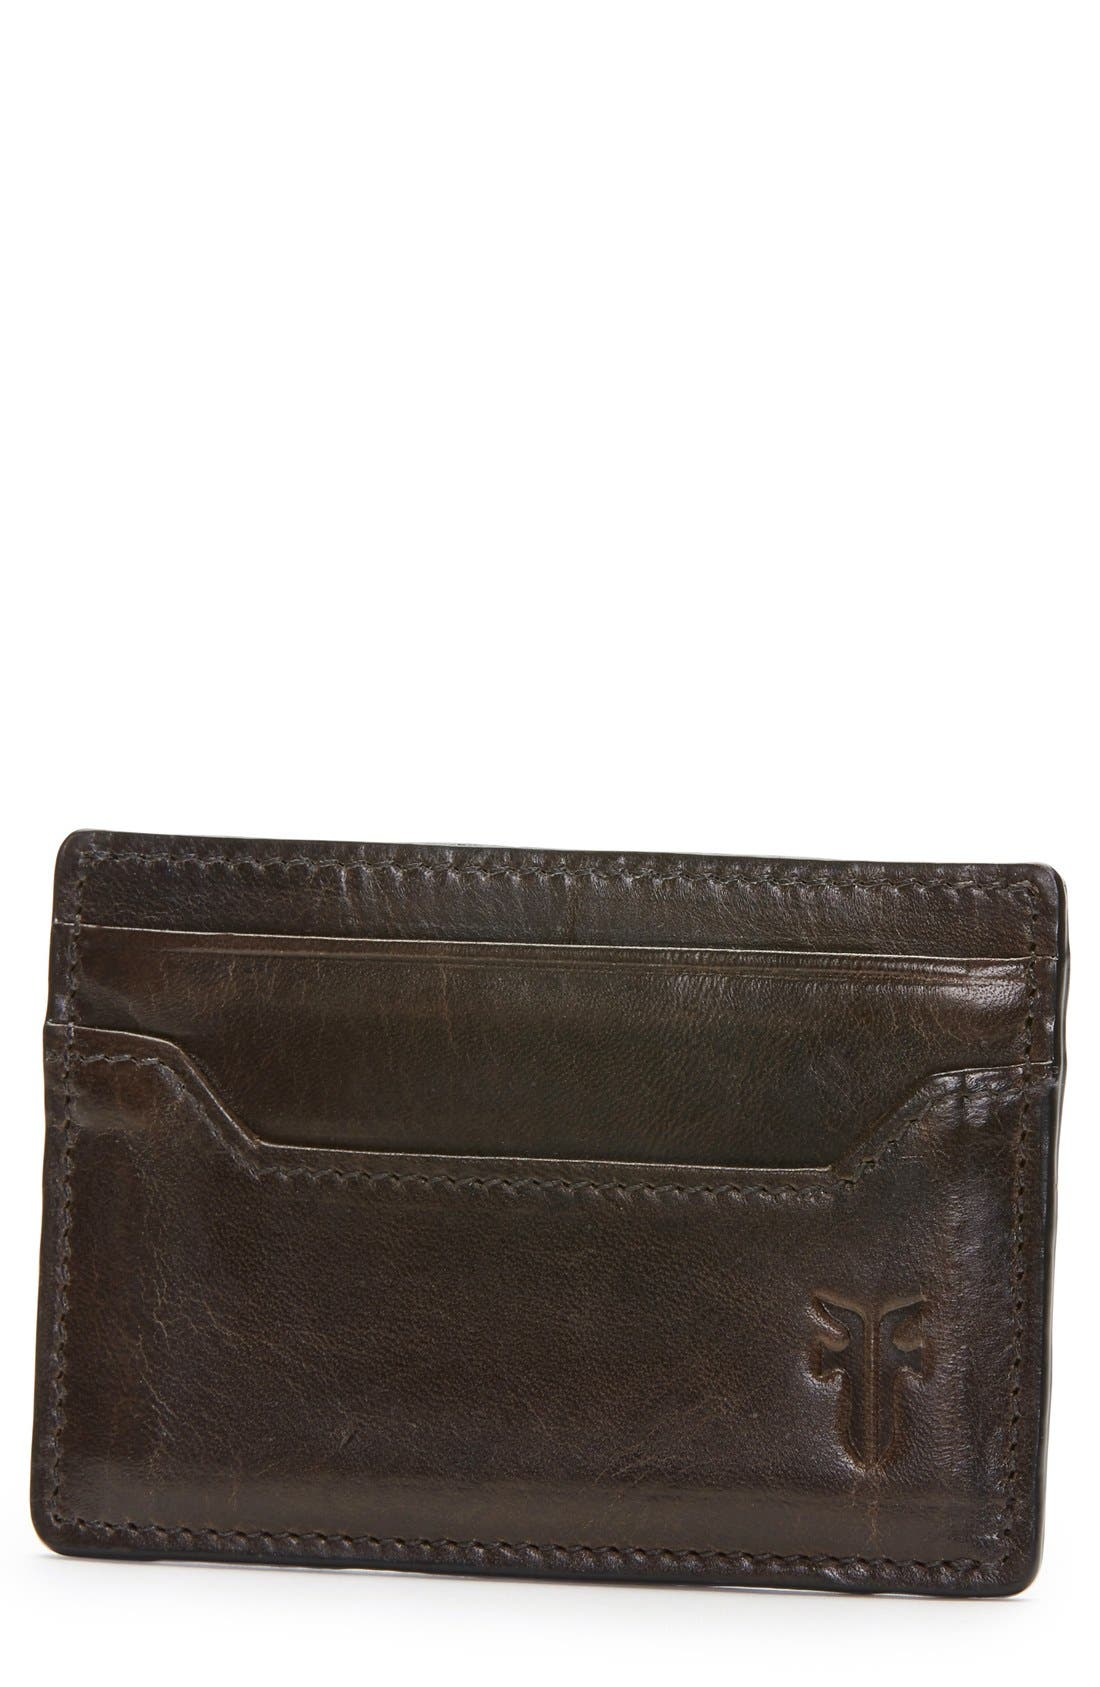 FRYE 'Logan' Leather Card Holder